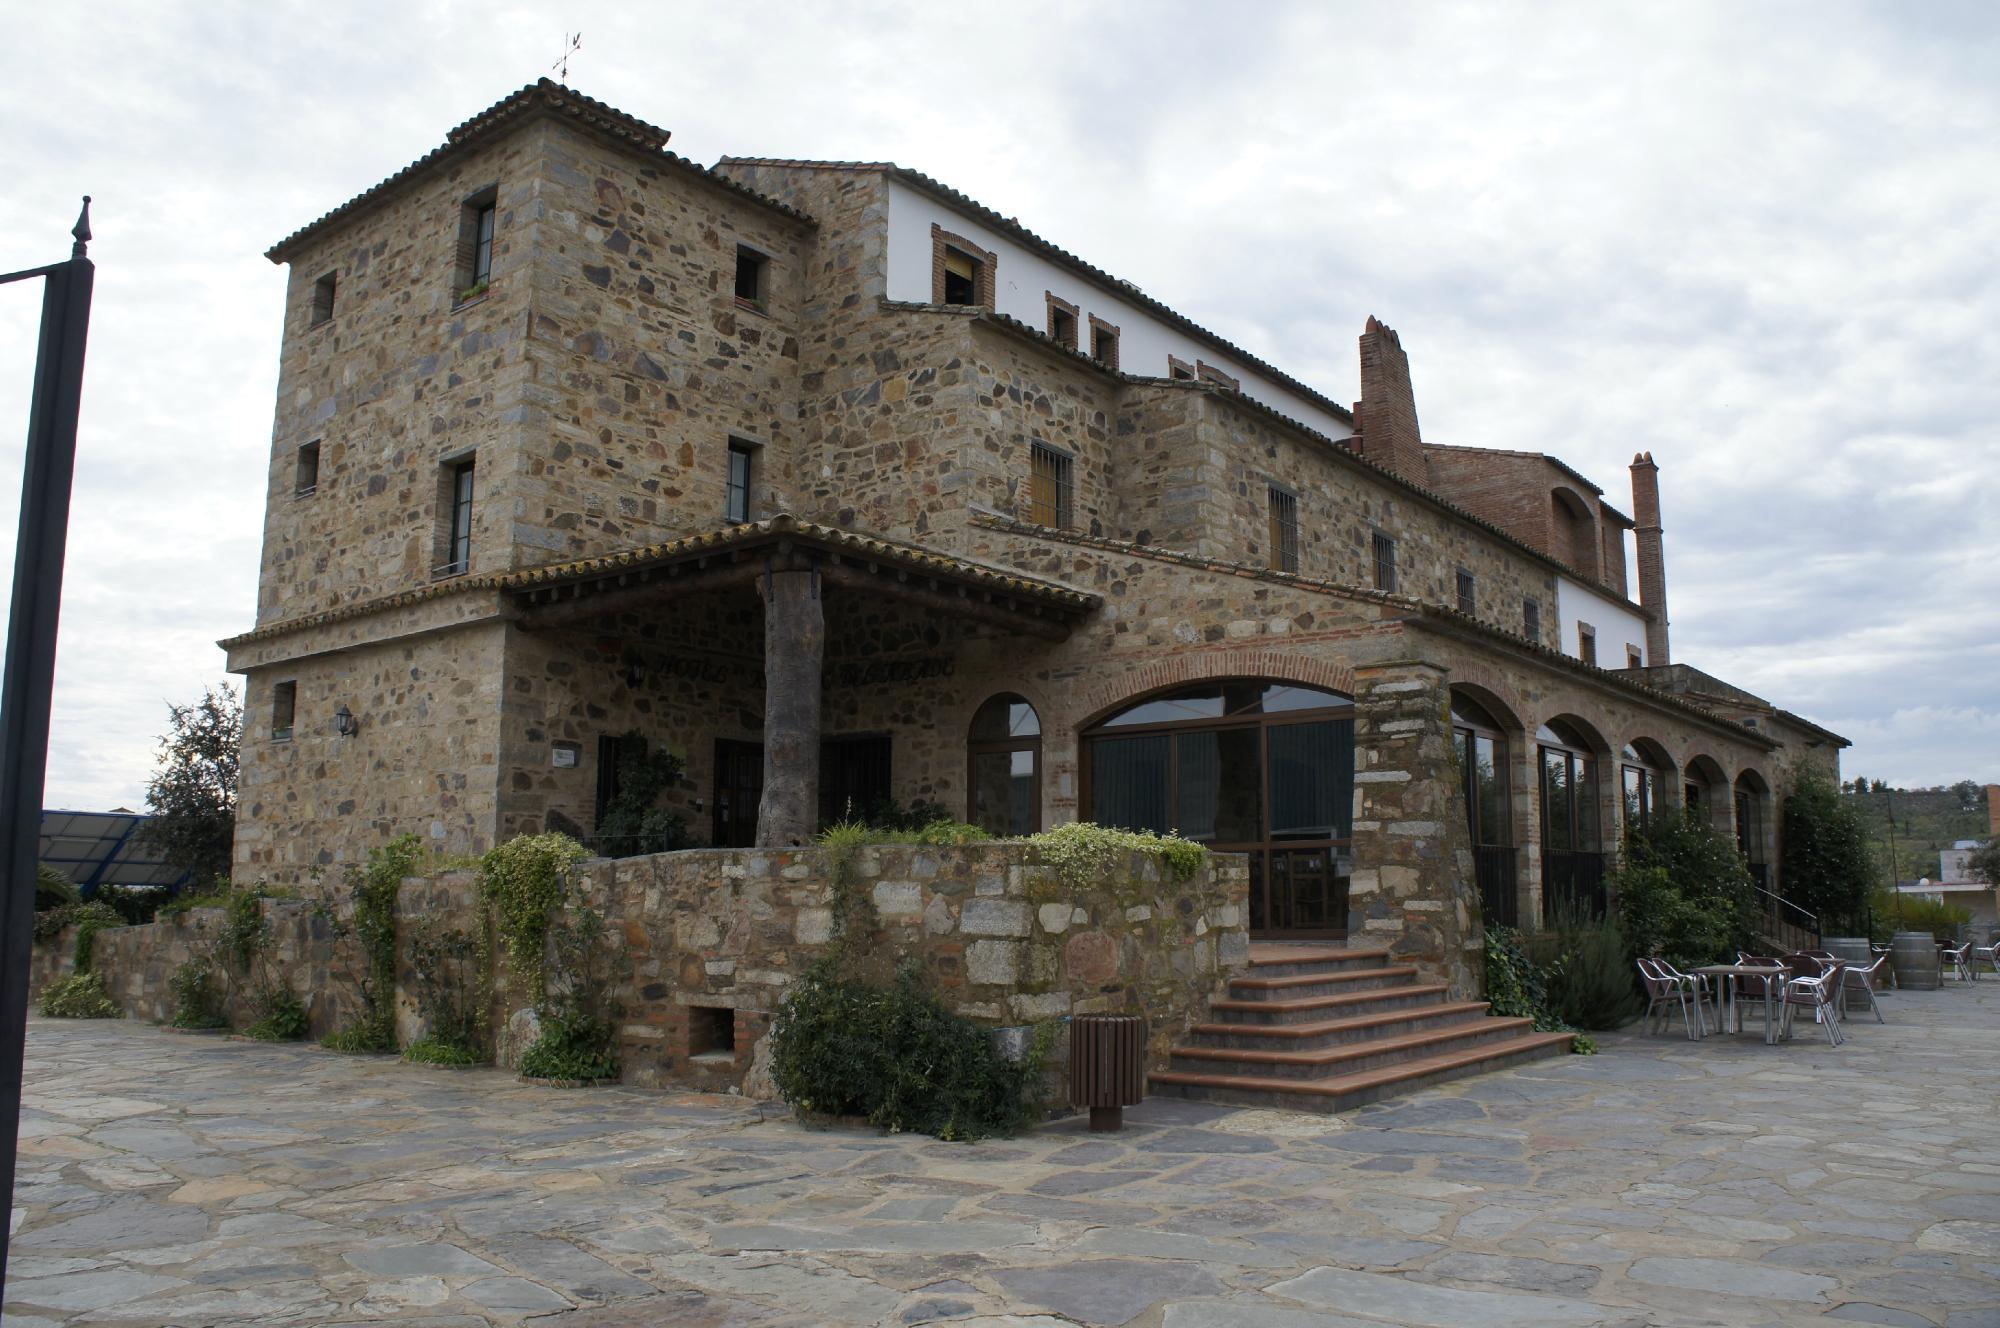 Hotel Rincon de Abade